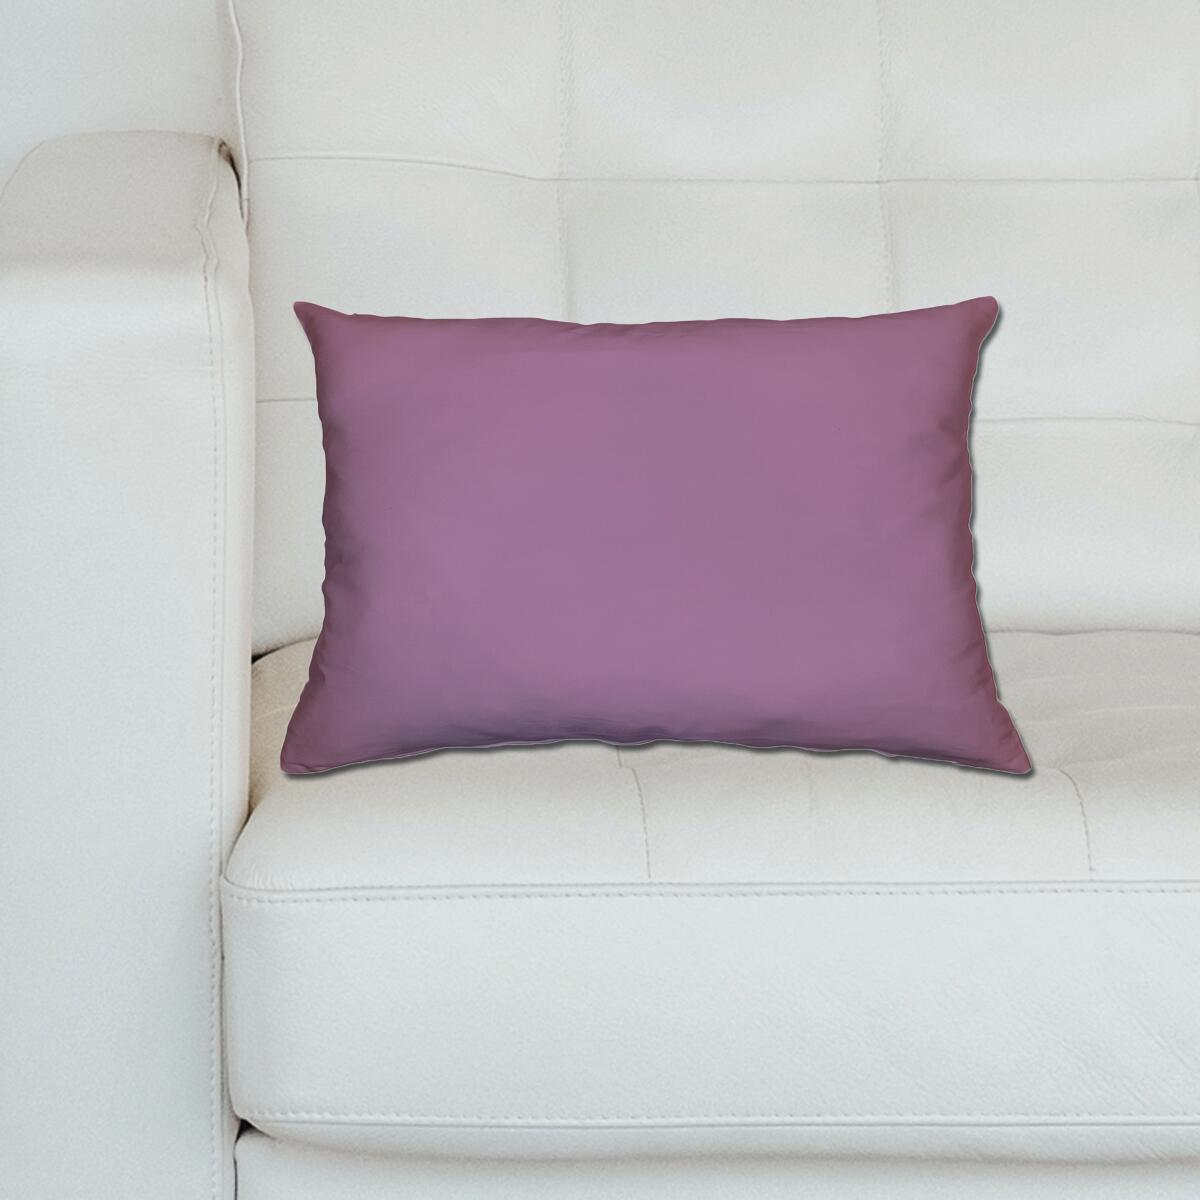 Cuscino Loneta lilla 40x60 cm - 2